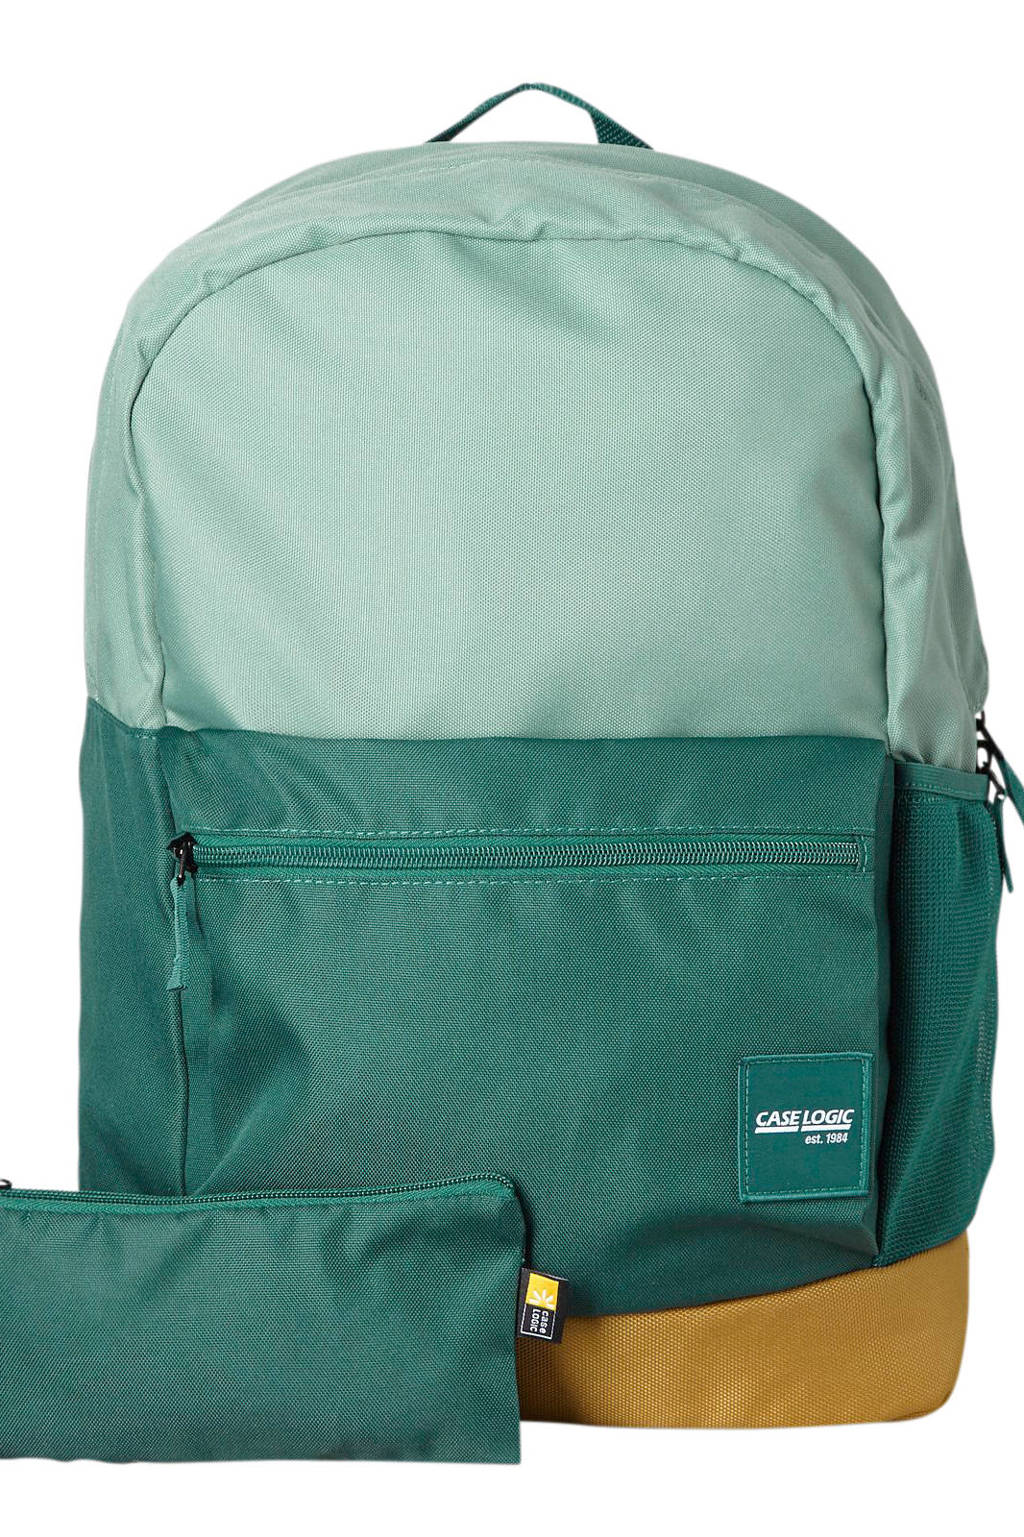 Case Logic  15,6 inch Campus Commence laptoptas rugzak, Groen/mintgroen/beige